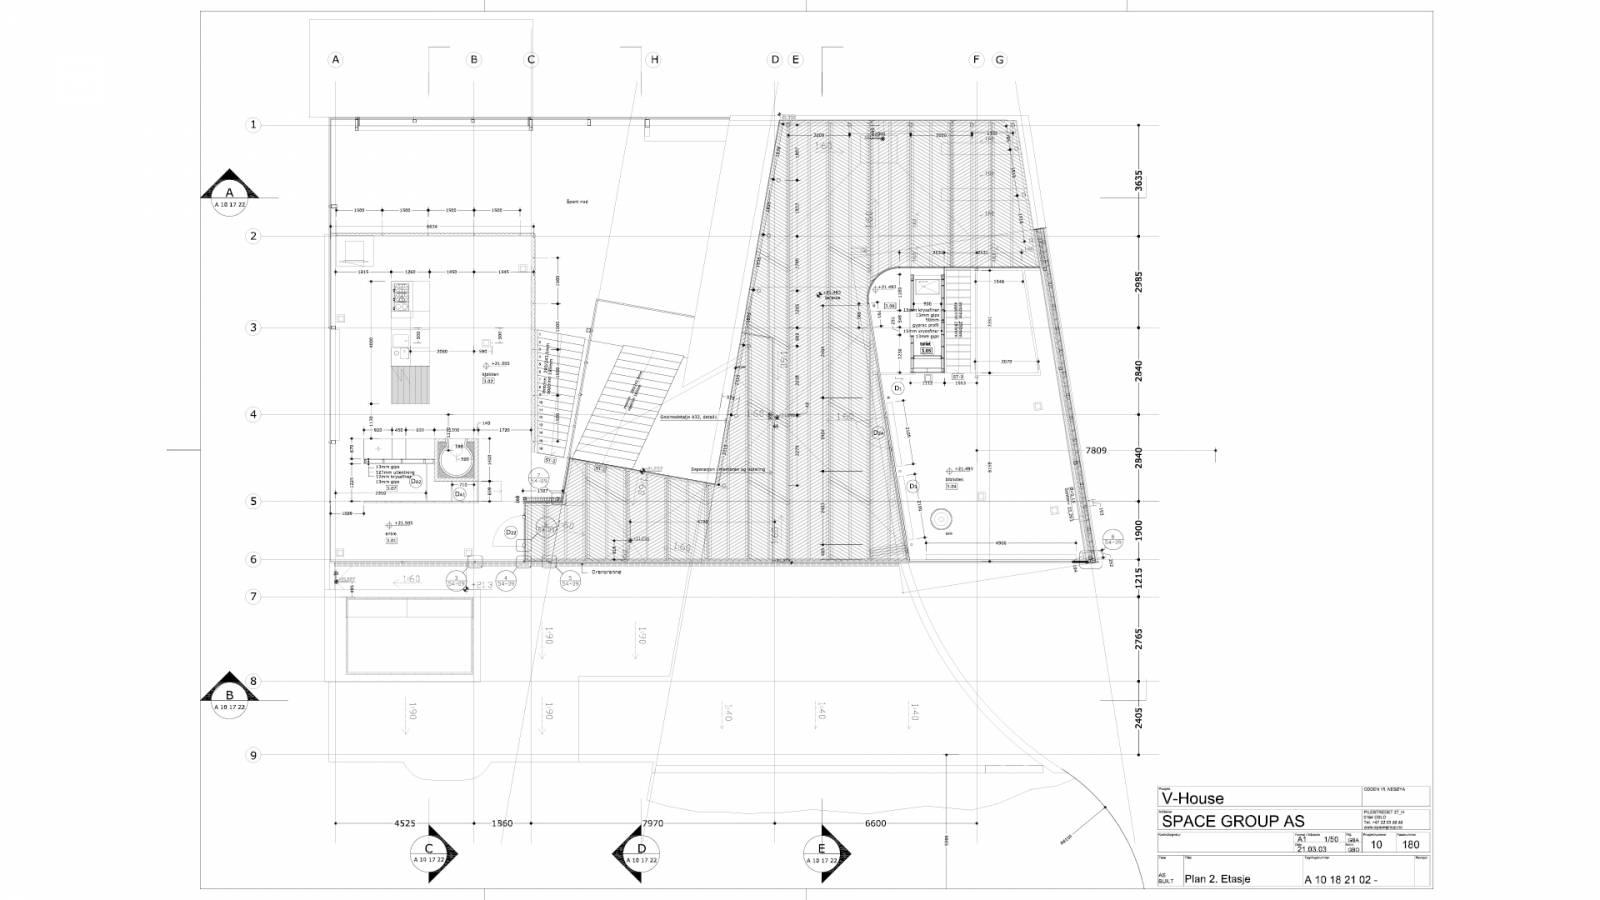 UPPER LEVEL PLAN - V-House - SPOL Architects